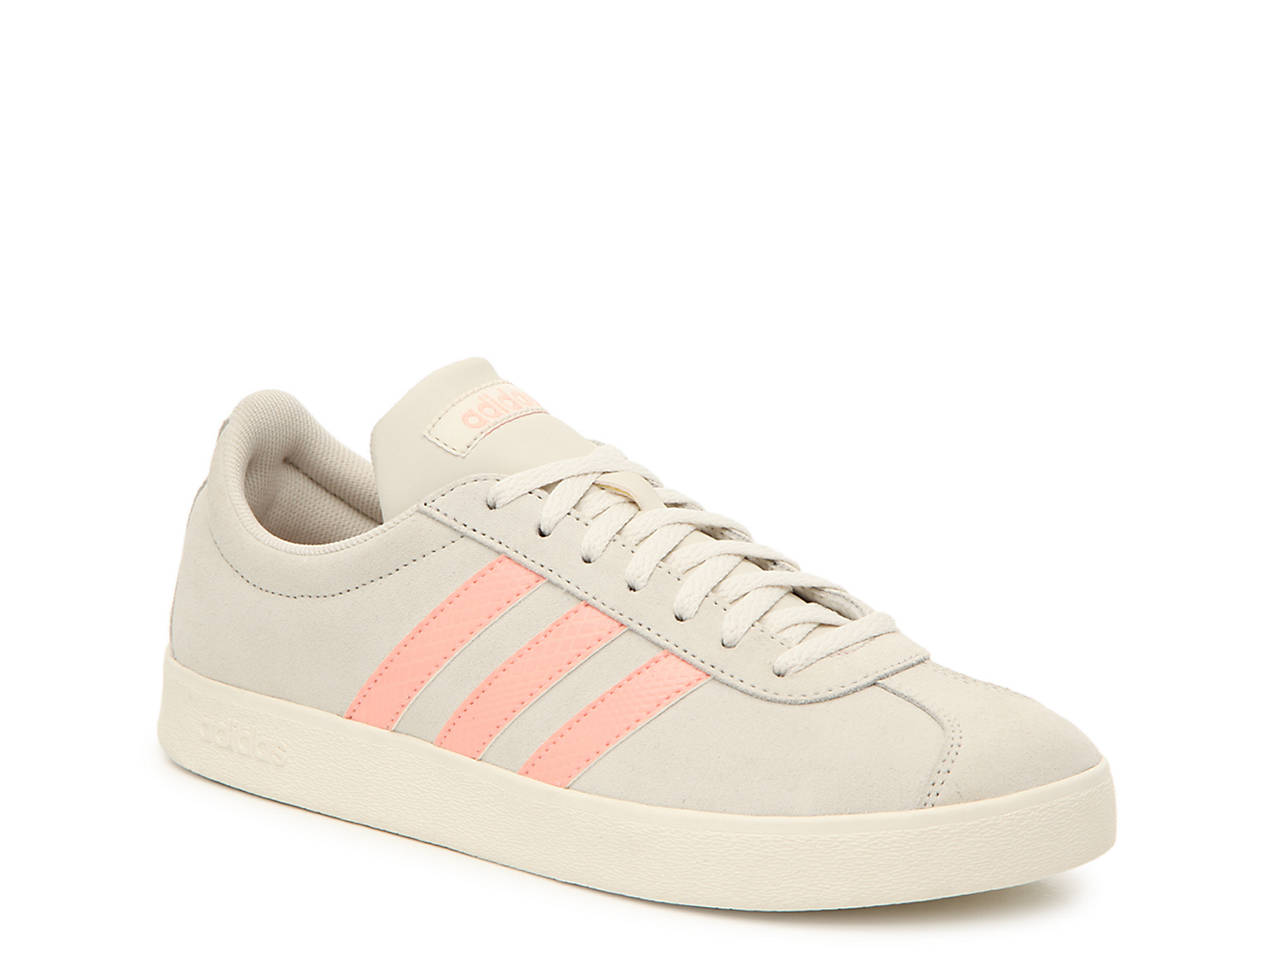 94d9abea1f774 adidas VL Court 2.0 Sneaker - Women s Women s Shoes